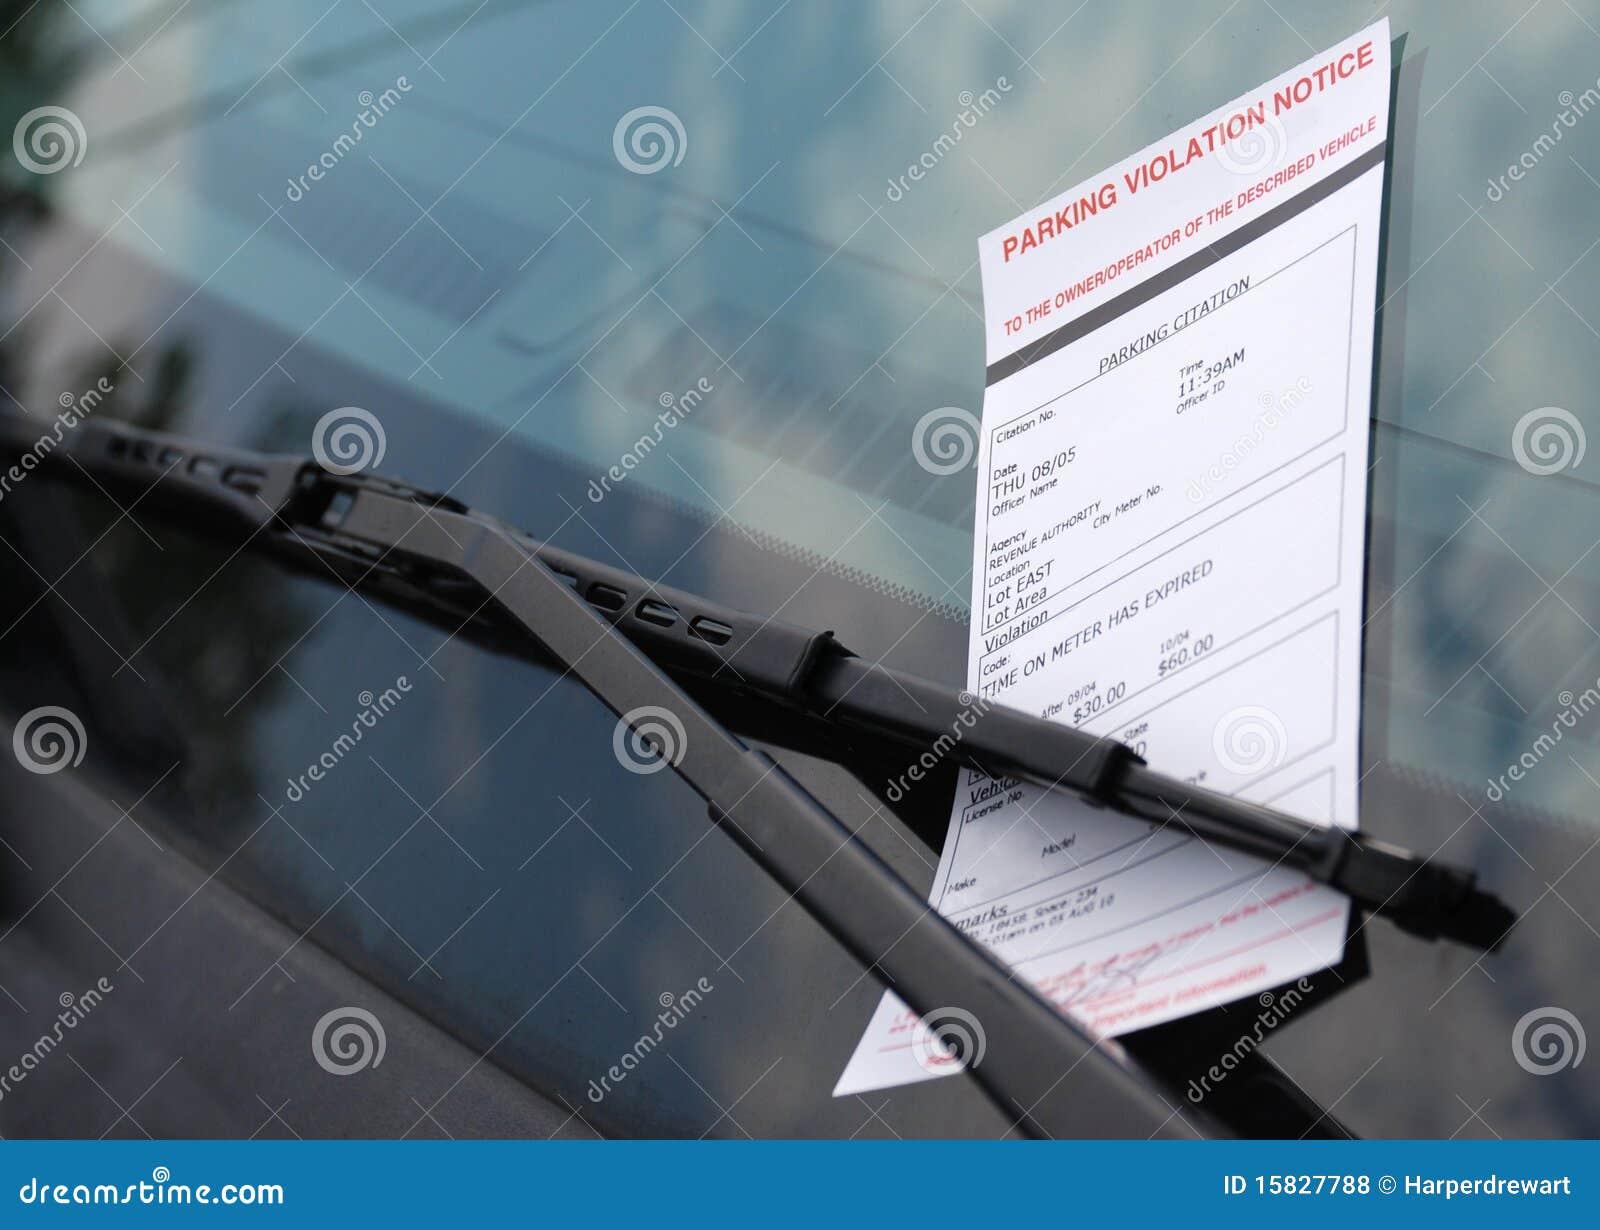 Park Car Ticket Chalk